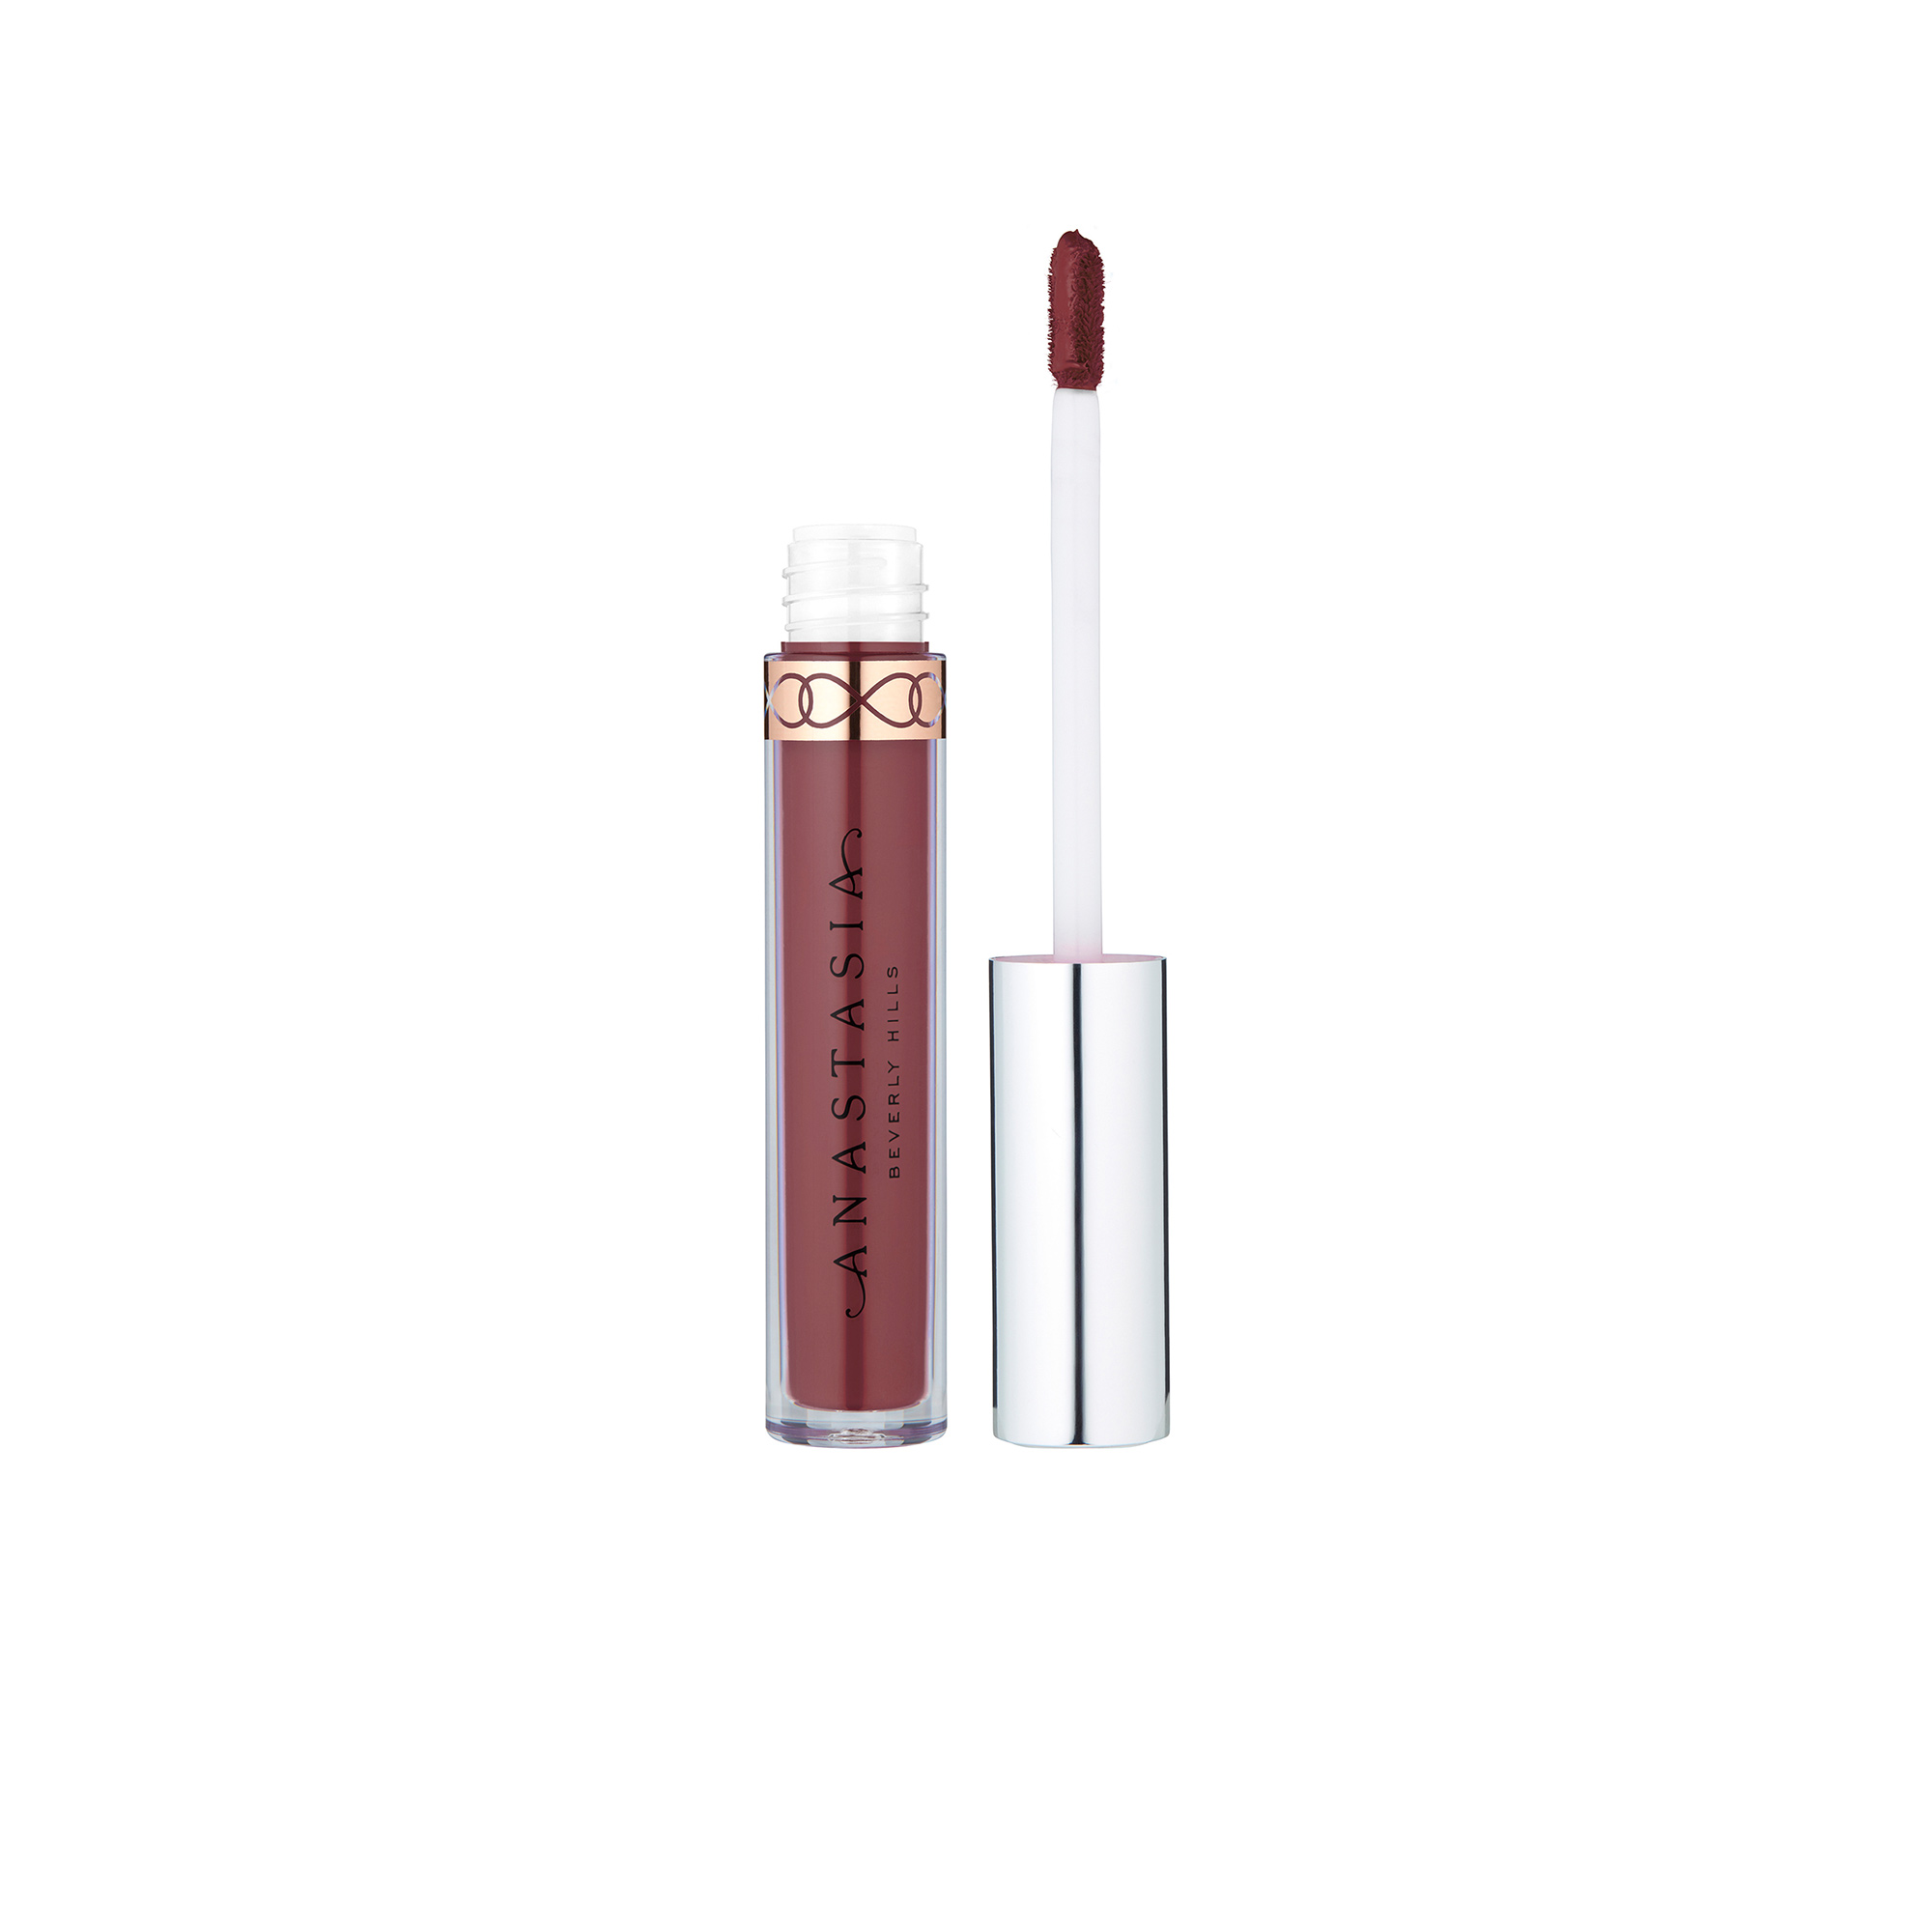 Liquid Lipstick - Veronica